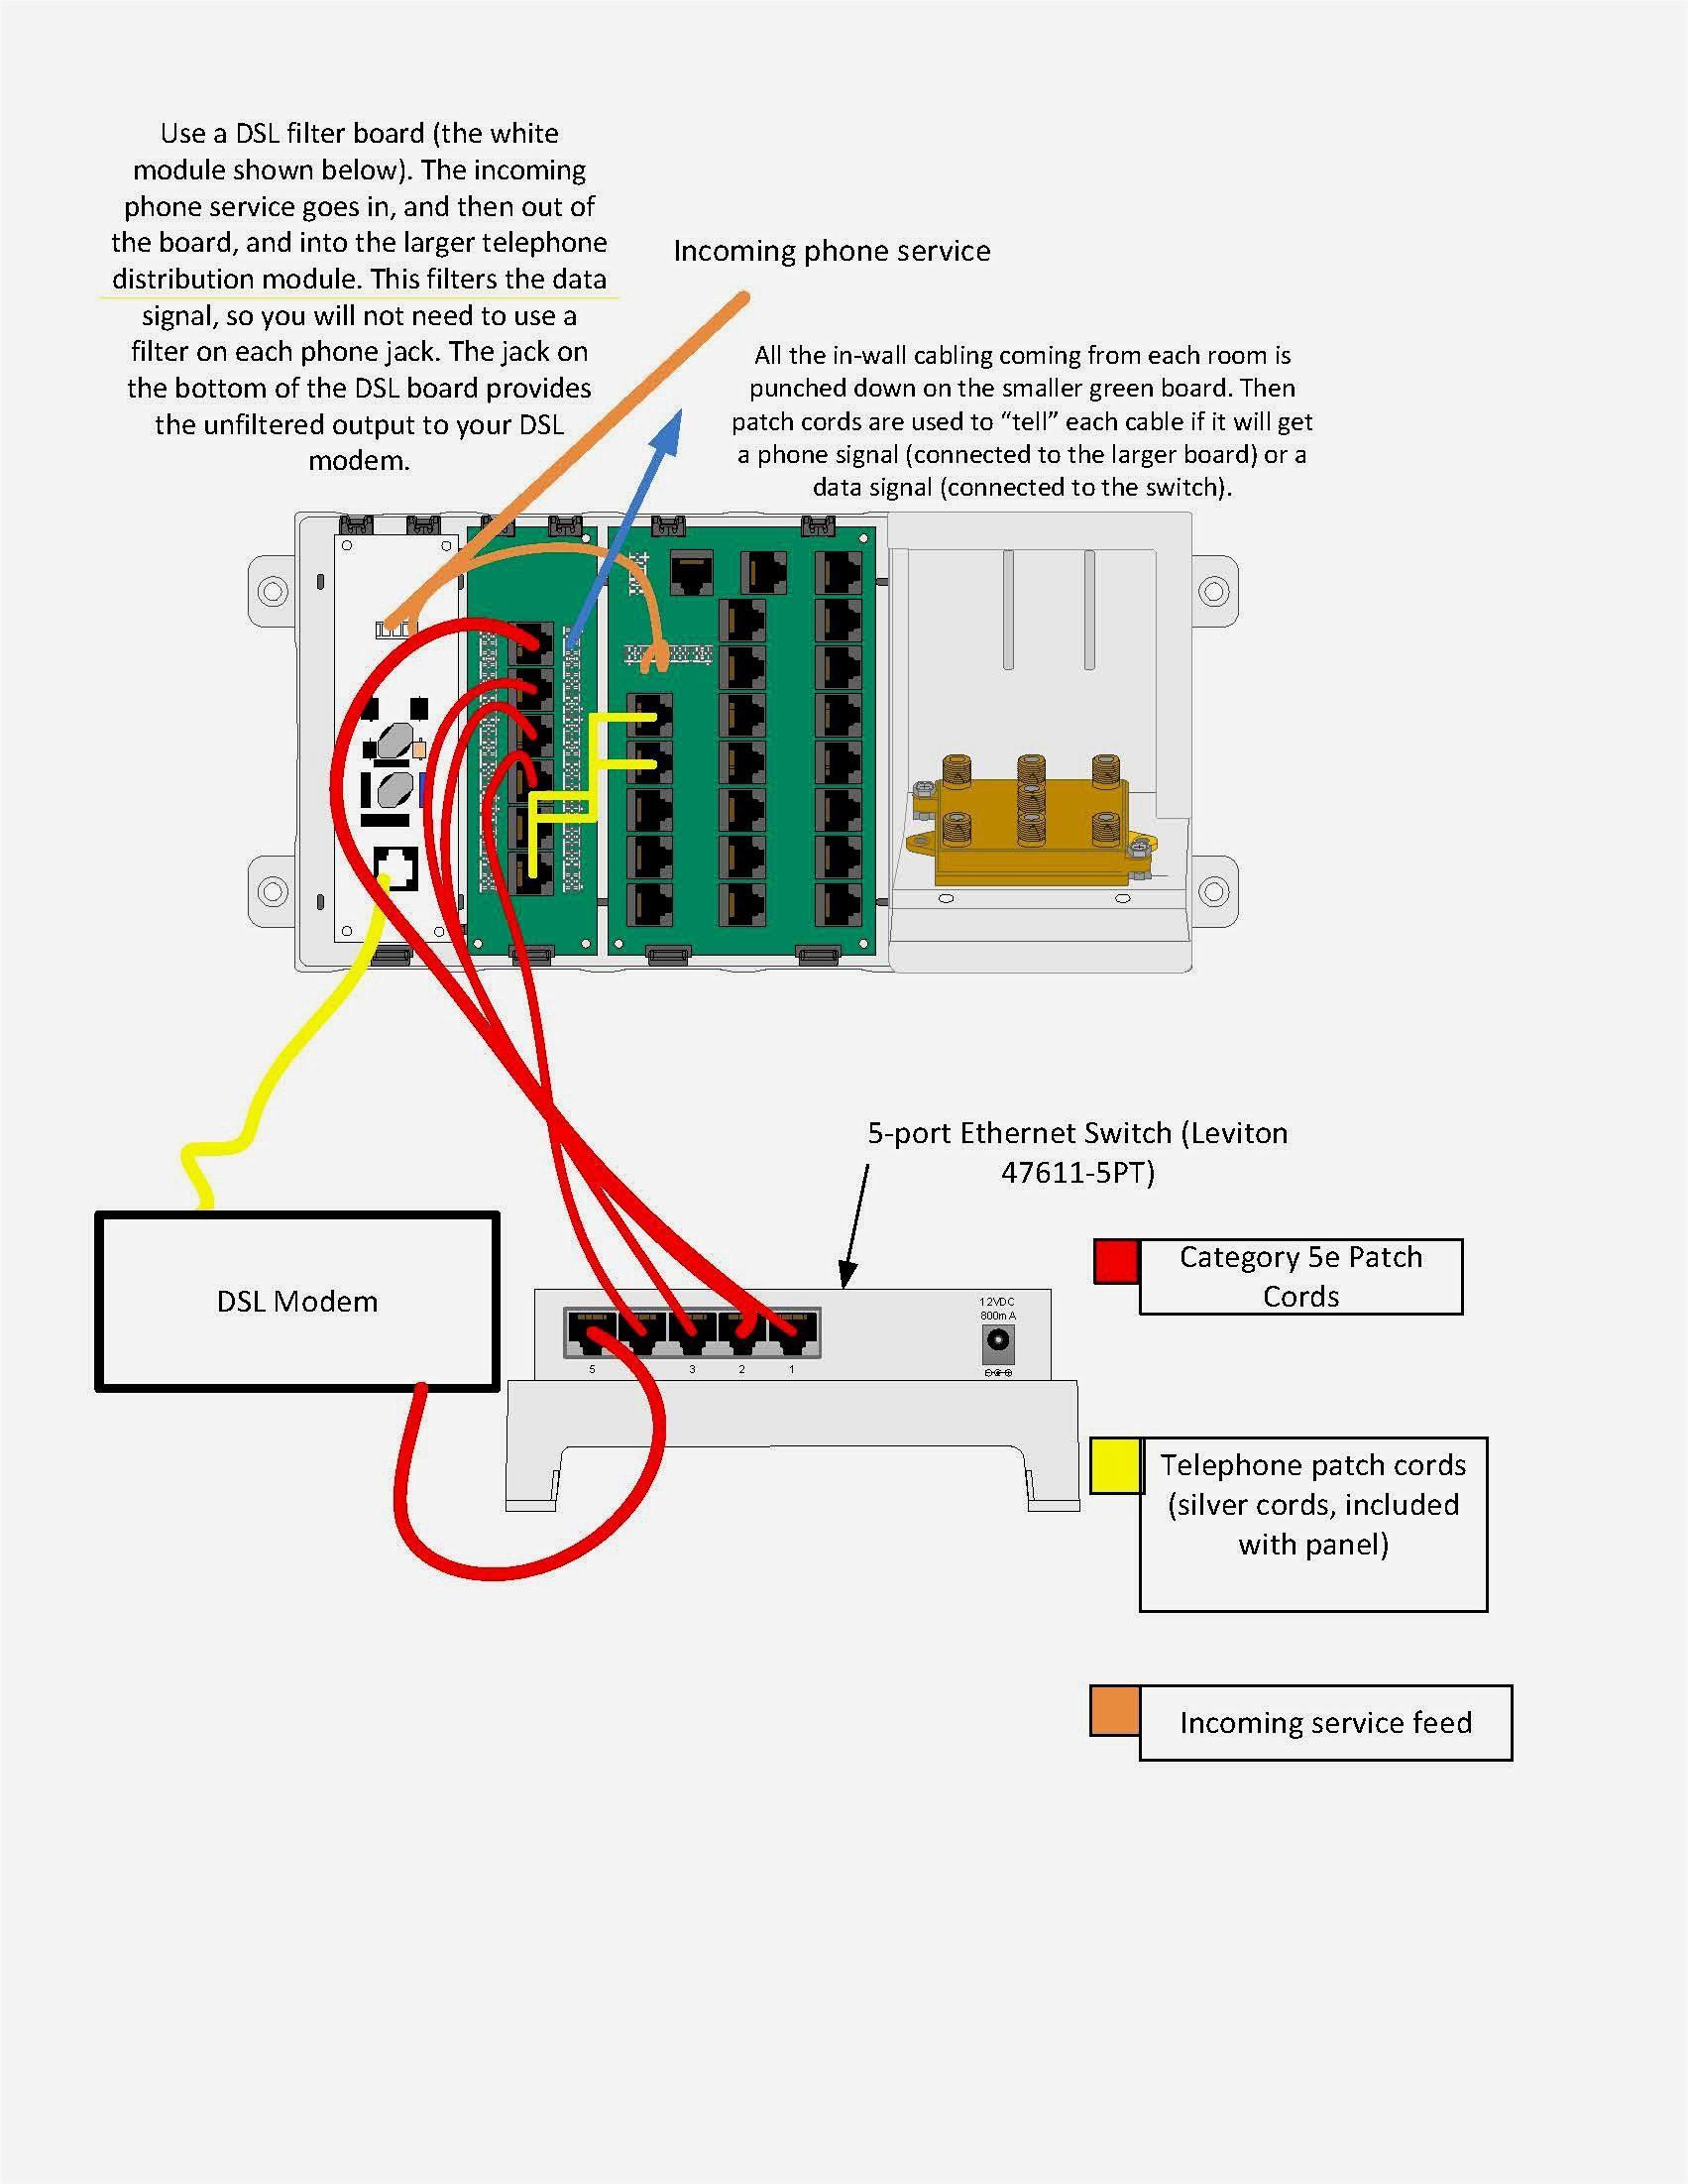 Leviton Network Wiring Diagram - Today Wiring Schematic Diagram on